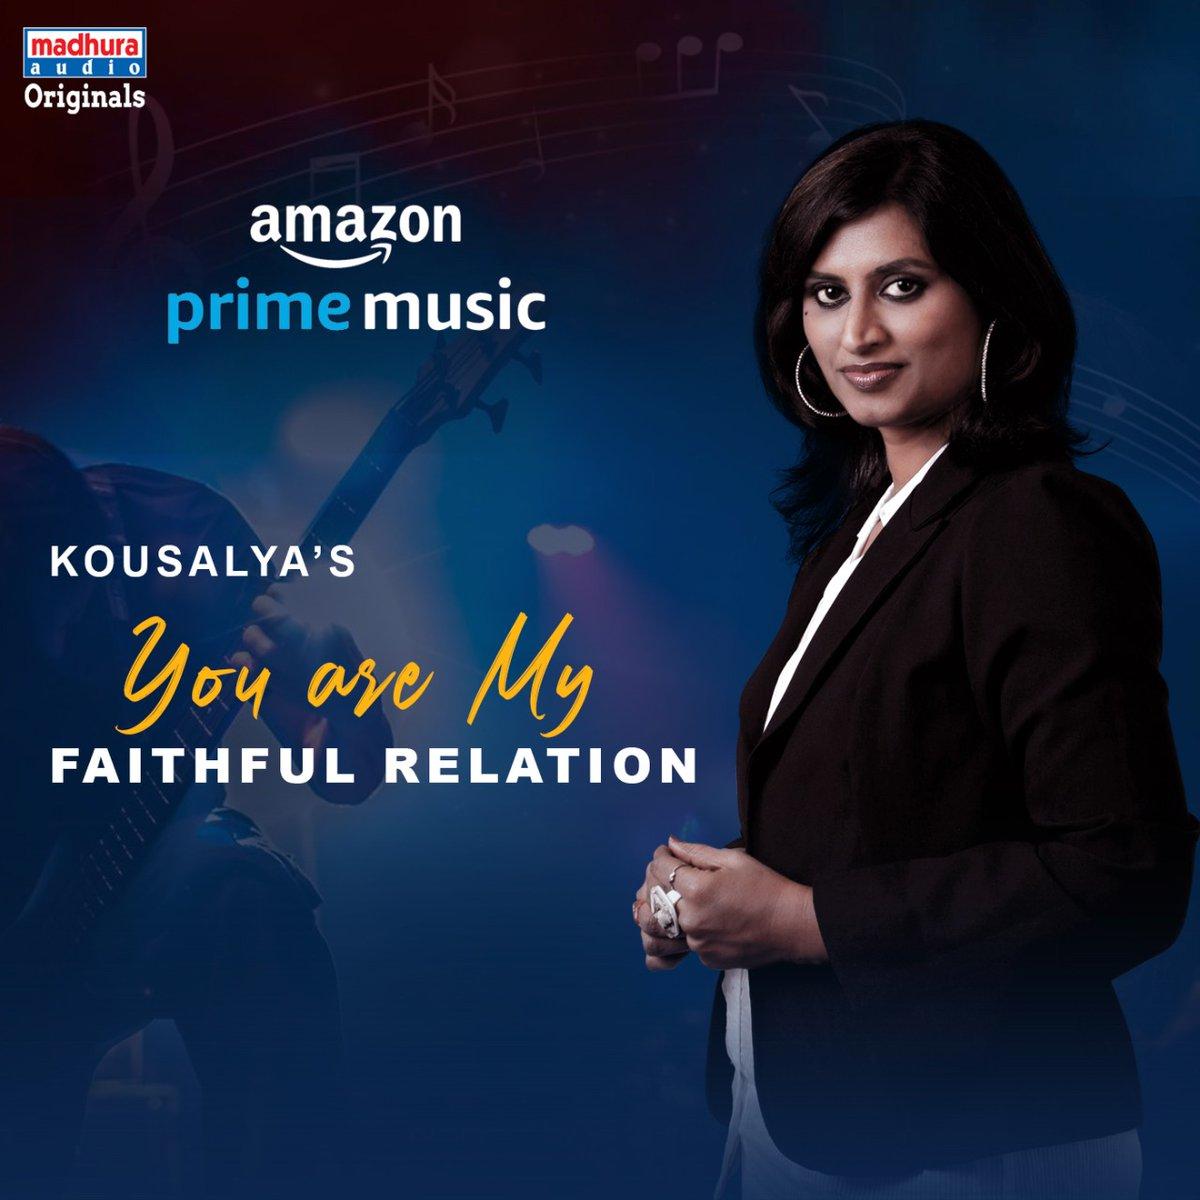 Talented Singer @Kousalyapotturi's #YouAreMyFaithfulRelation IS Streaming On Your Favorite OTT App  @amazonmusic:  https://music.amazon.in/albums/B08B5YKZ5B?tab=CATALOG…pic.twitter.com/nf802WhKf2